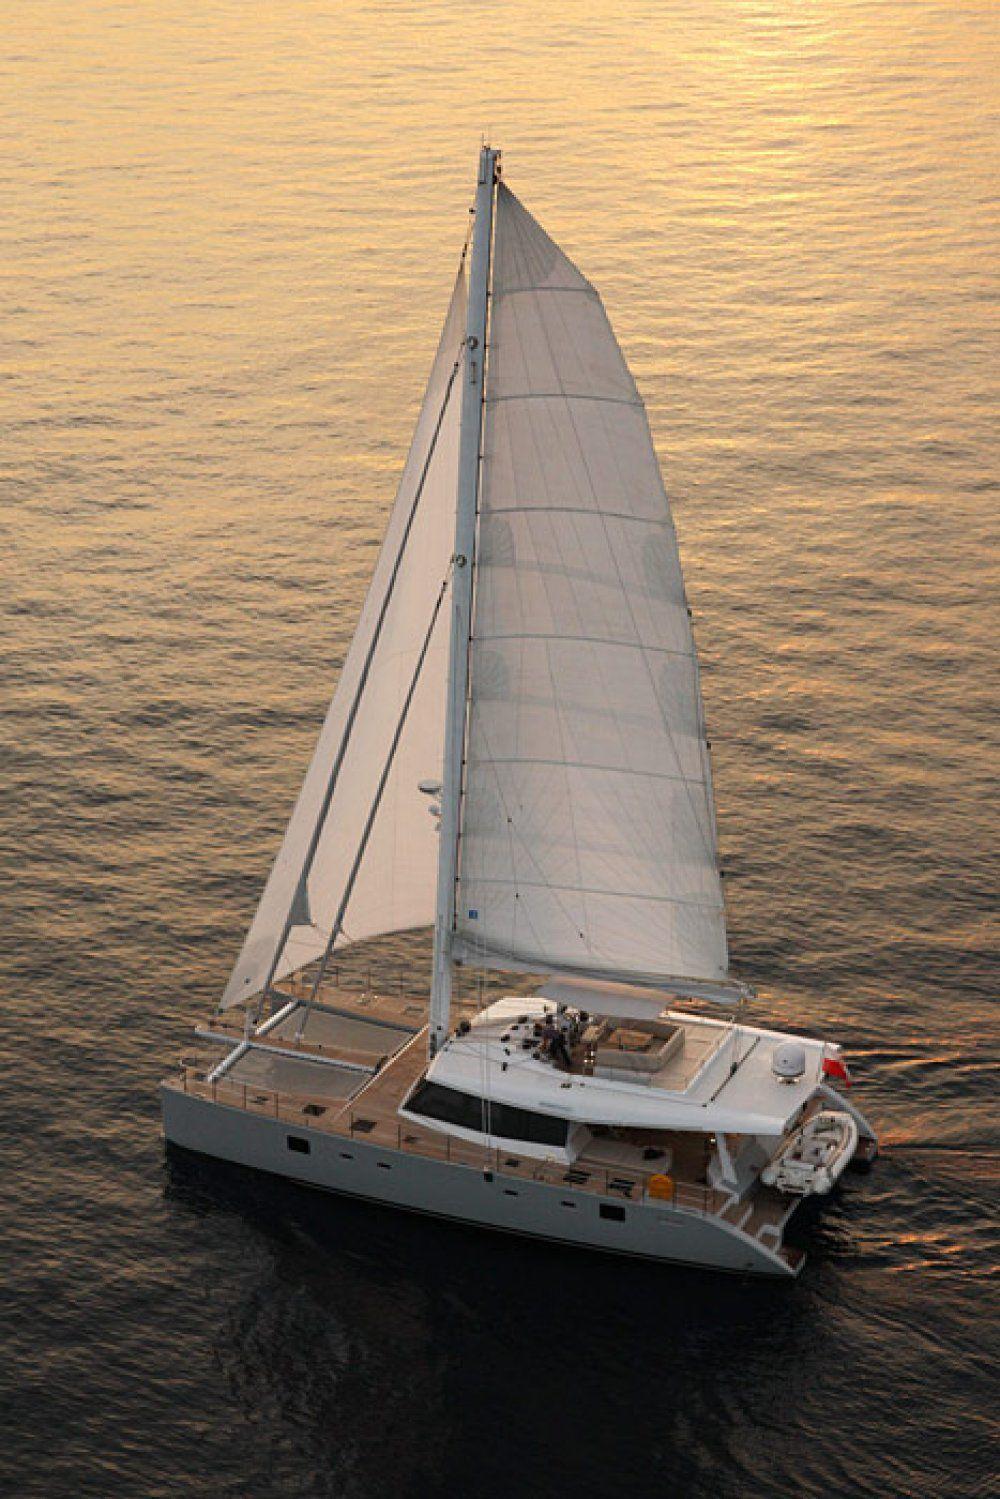 Charter catamaran miss kirsty british virgin islands for By the cabin catamaran charters